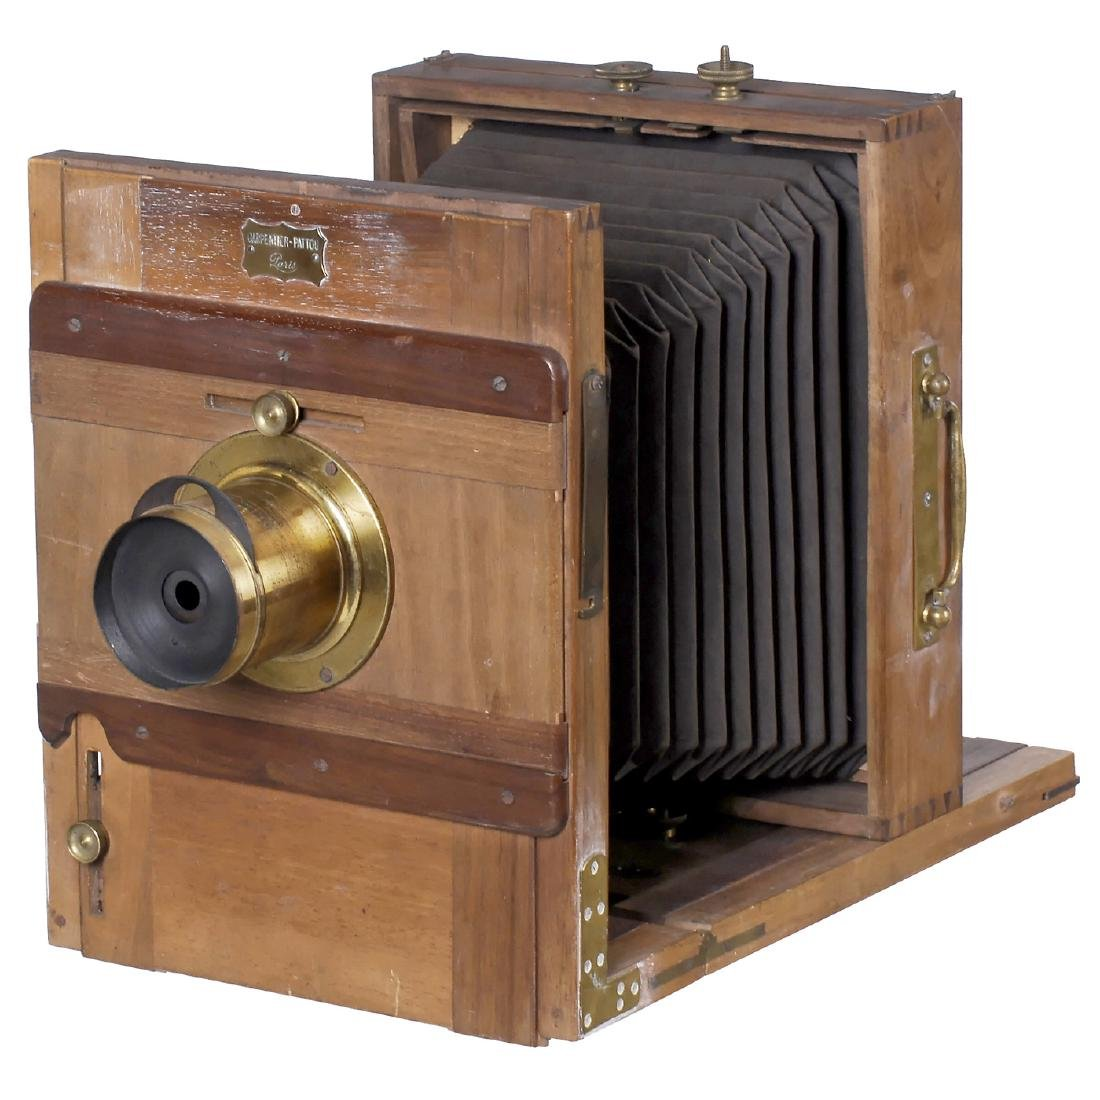 Field Camera by Carpentier-Pattou, c. 1870